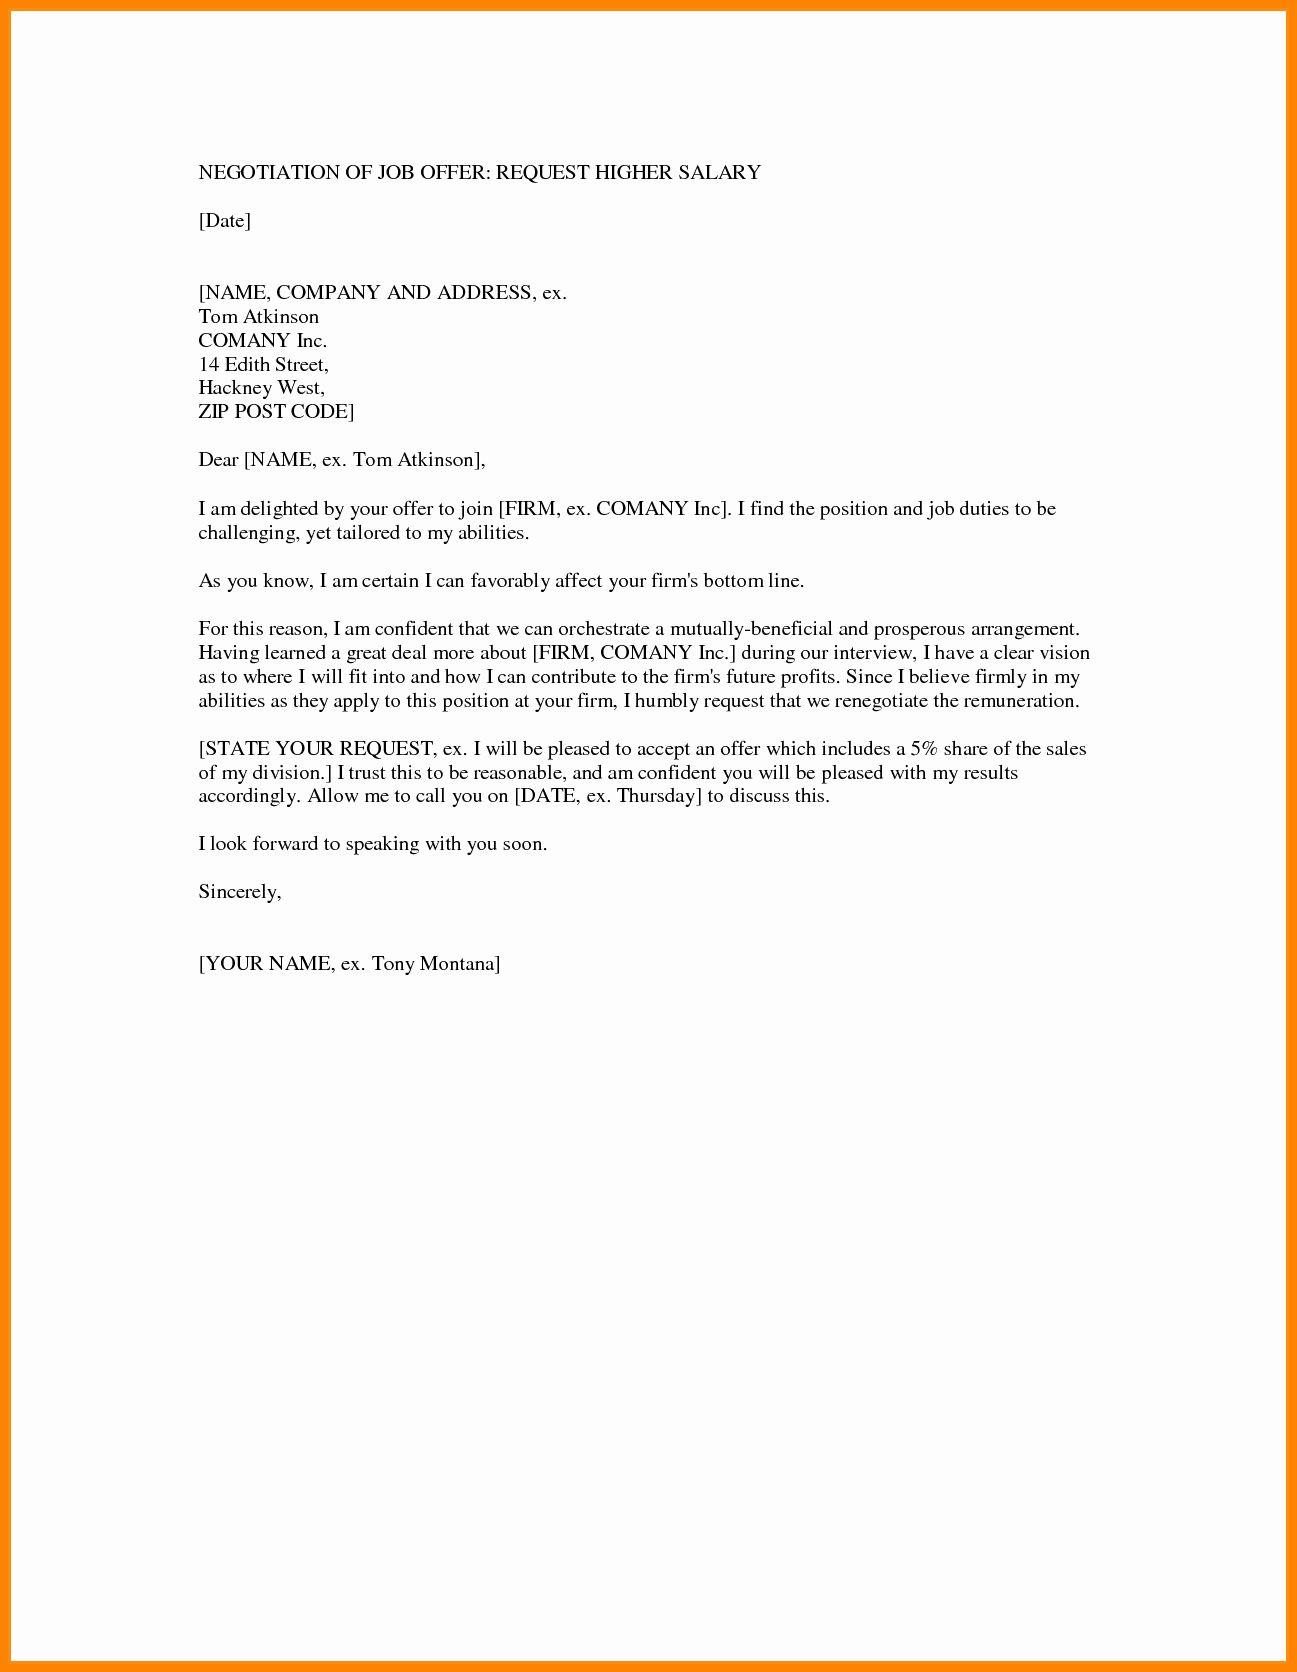 Counter Offer Letter Template Fresh 5 Counter Offer Letter Samples Letter Templates Lettering Job Letter